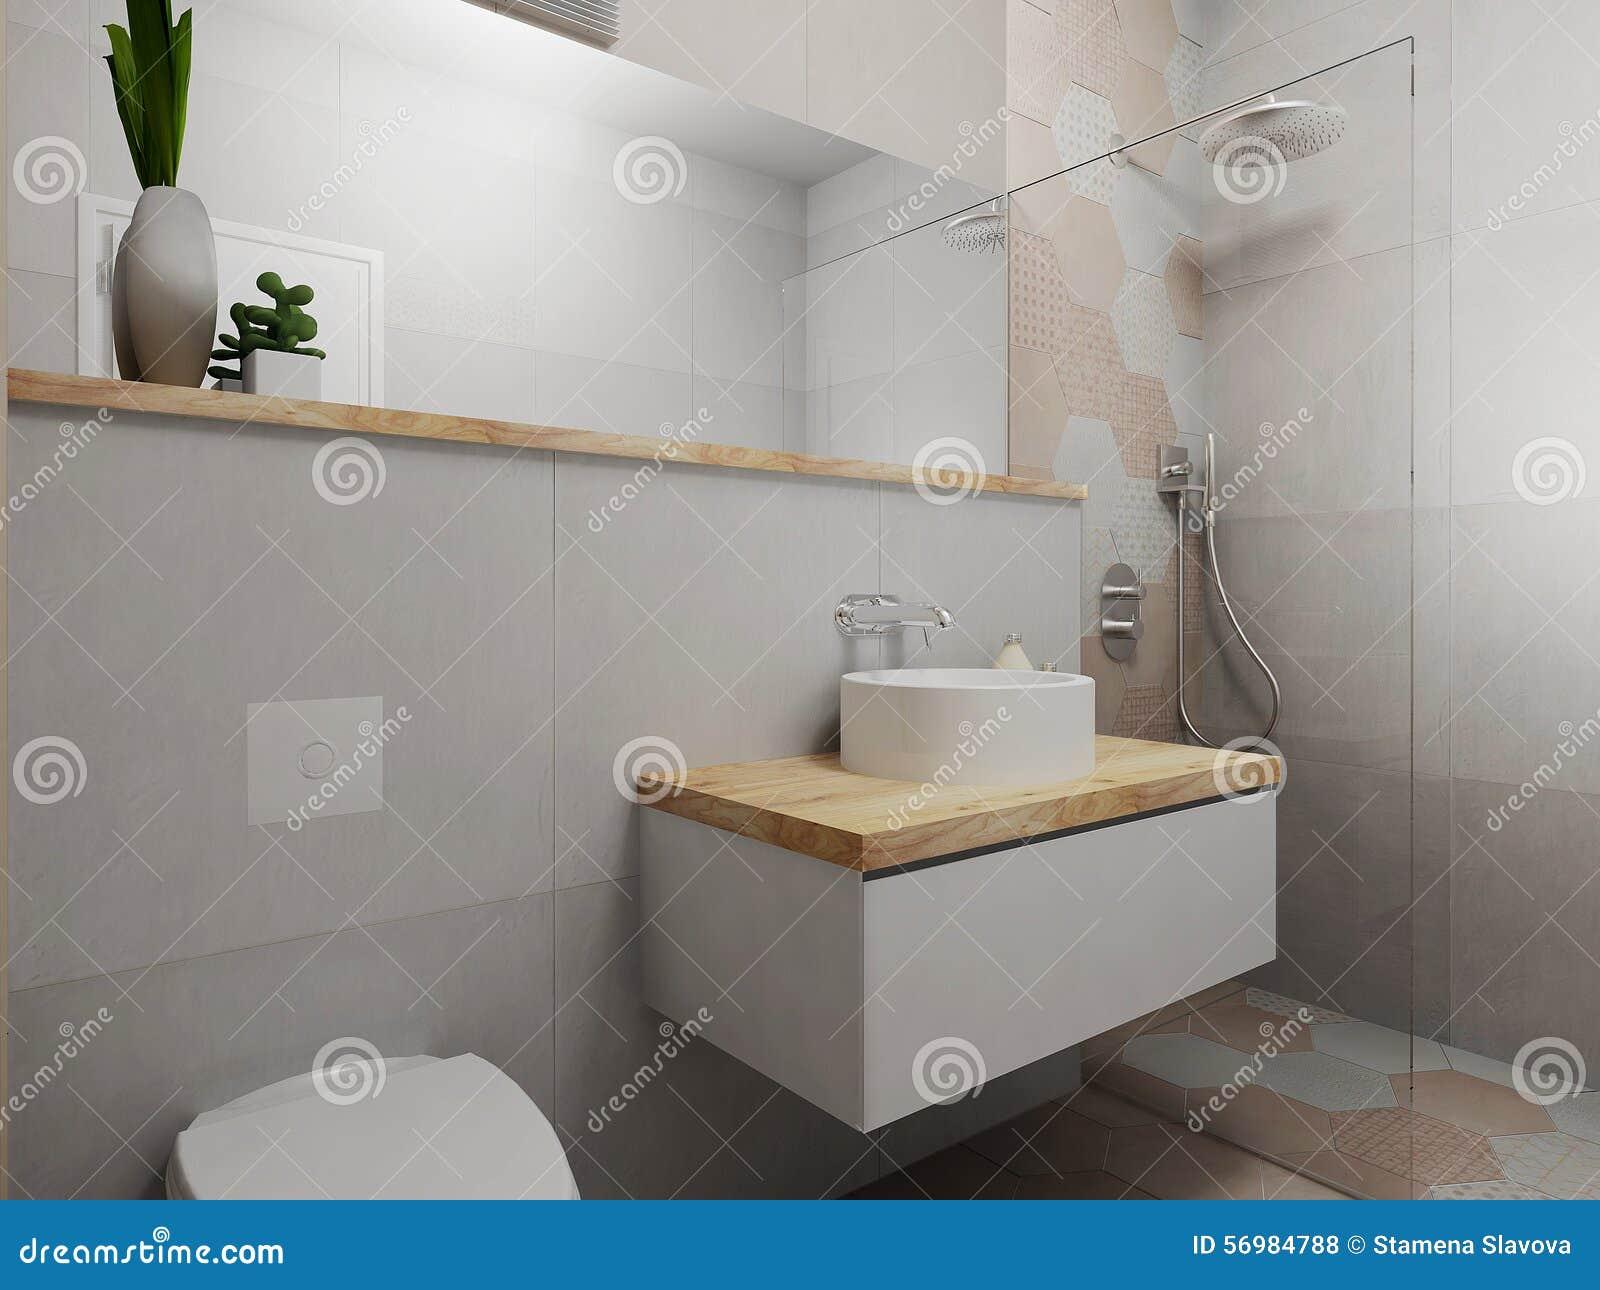 Modern Bathroom Images